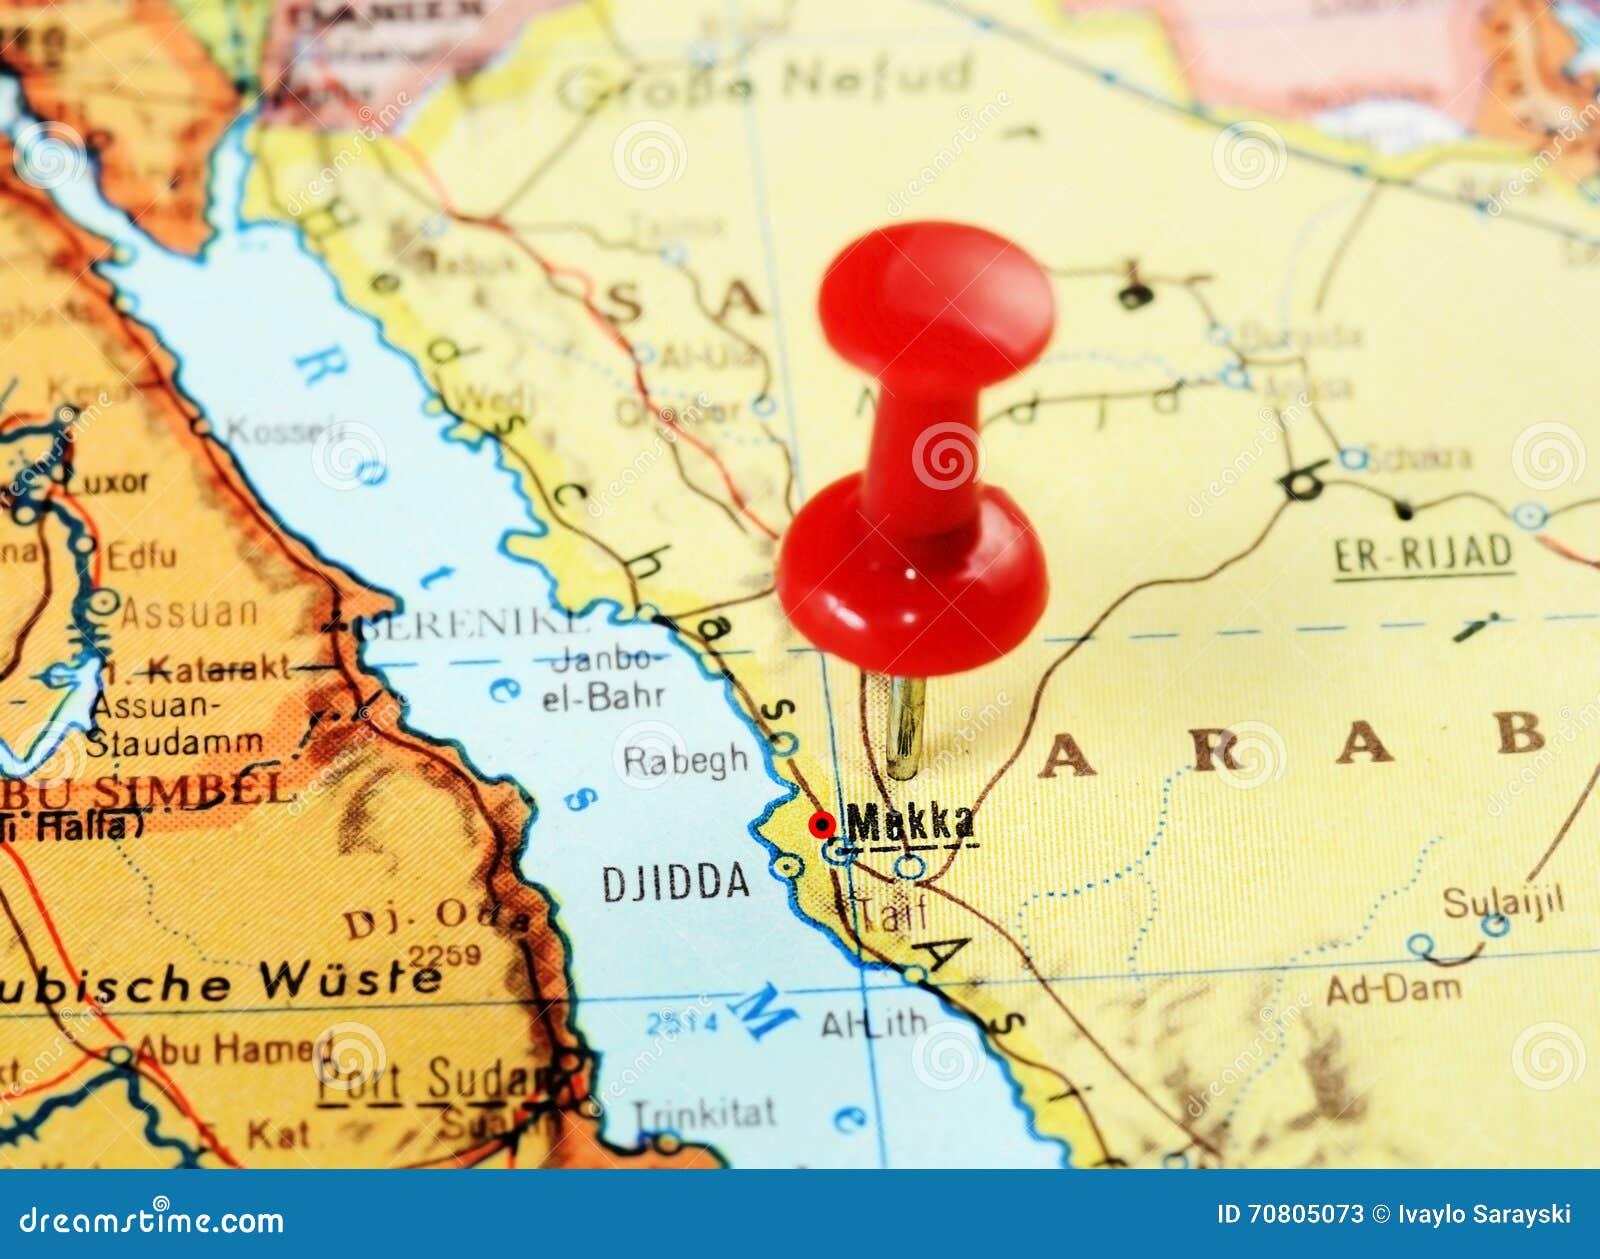 Mecca,Saudi Arabia map stock image. Image of destination - 70805073